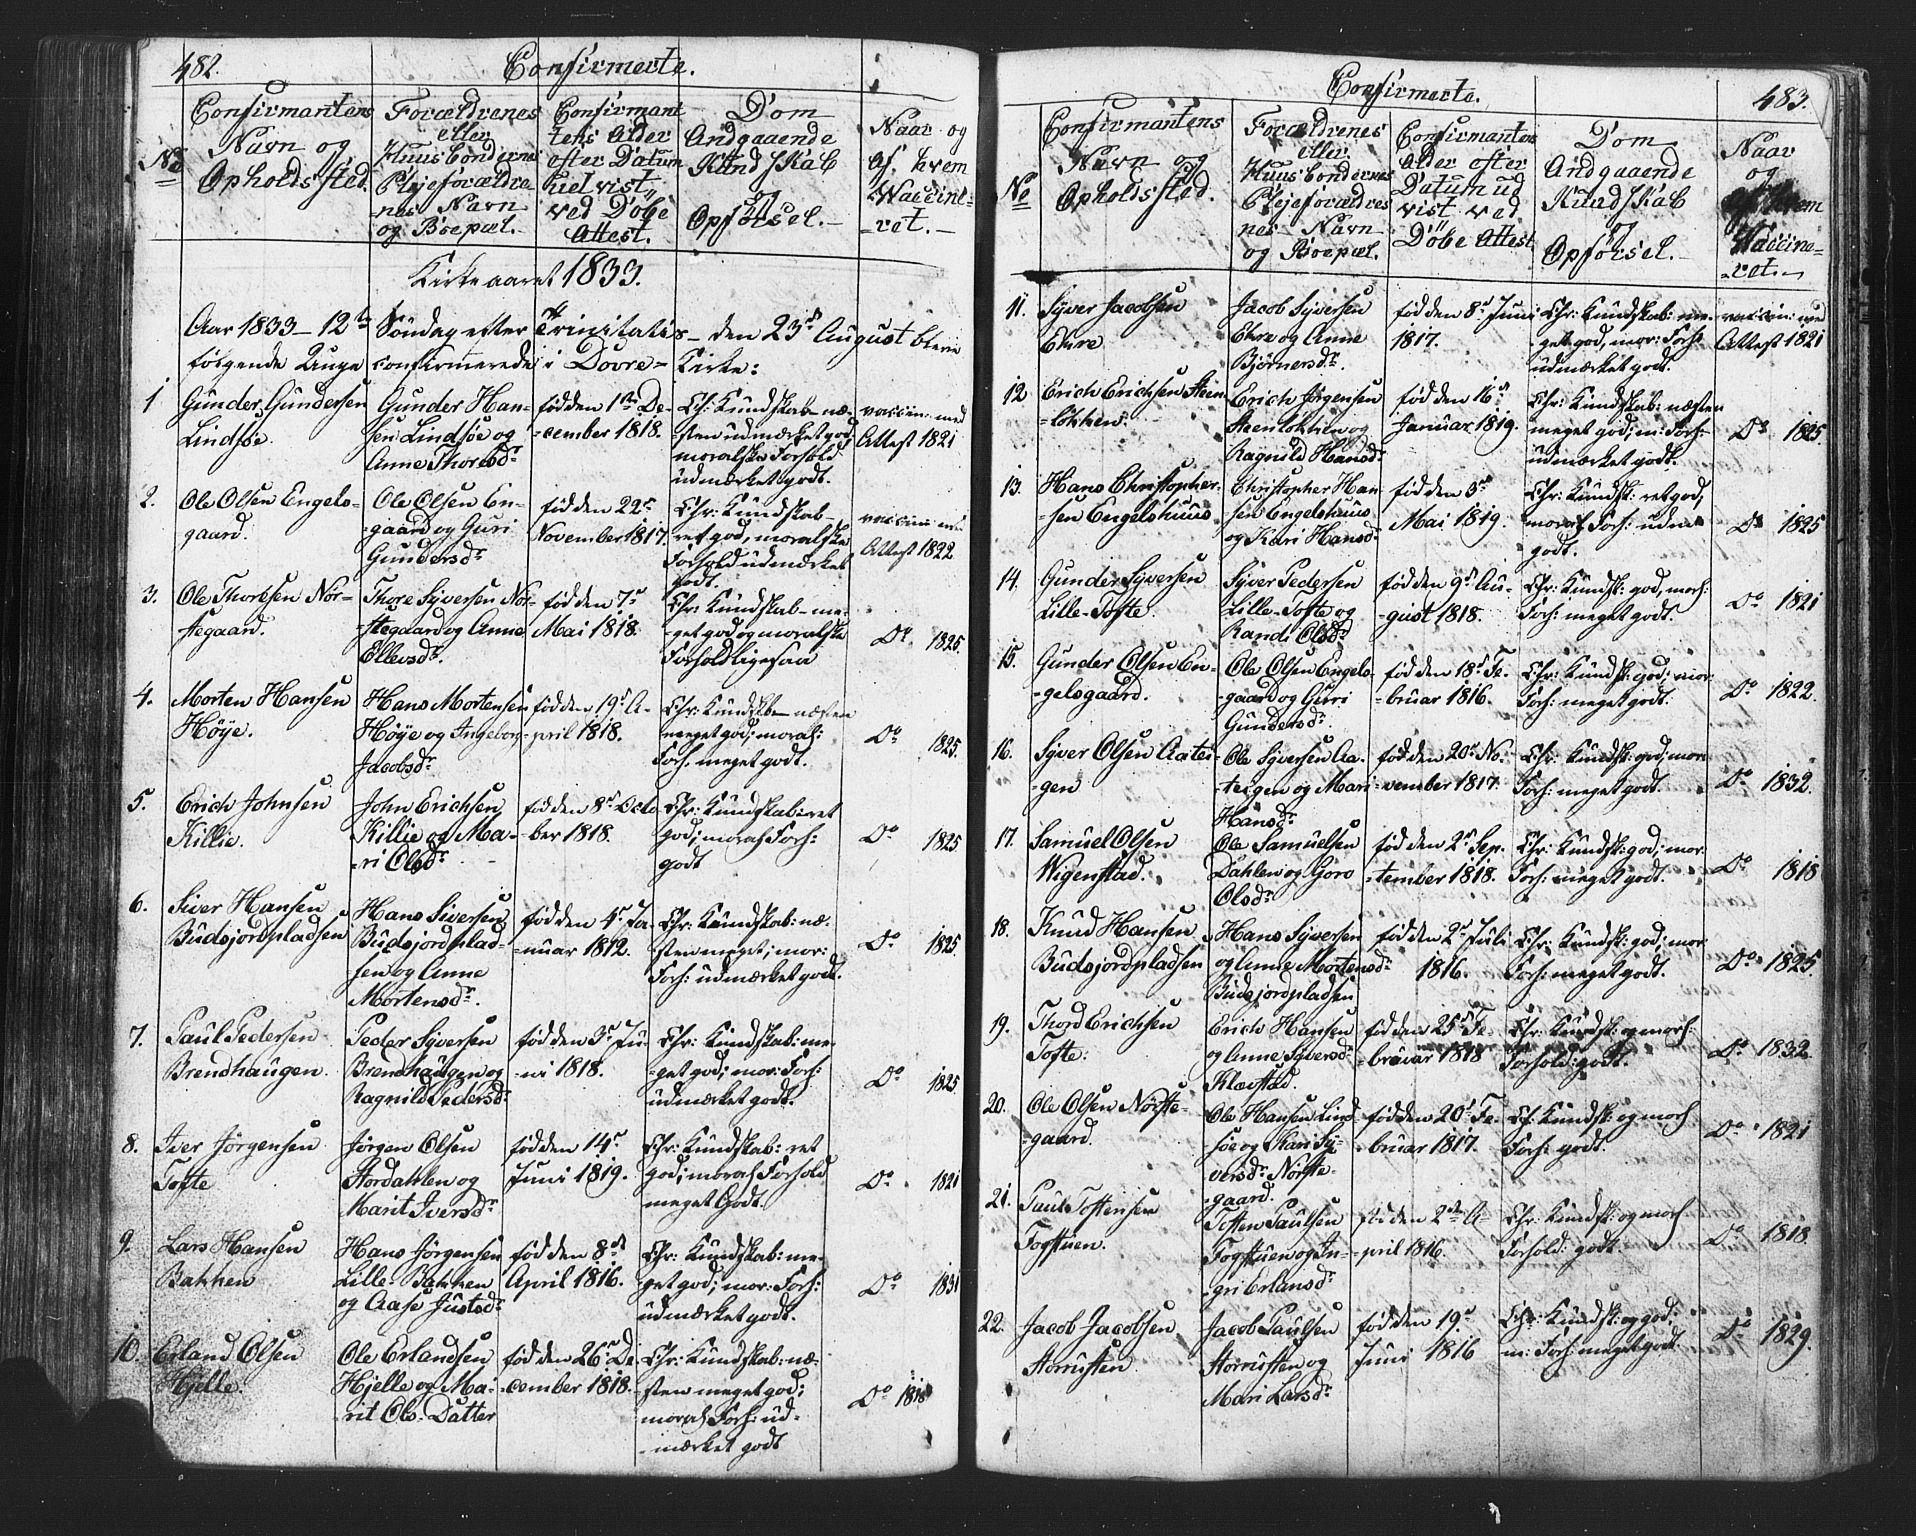 SAH, Lesja prestekontor, Klokkerbok nr. 2, 1832-1850, s. 482-483